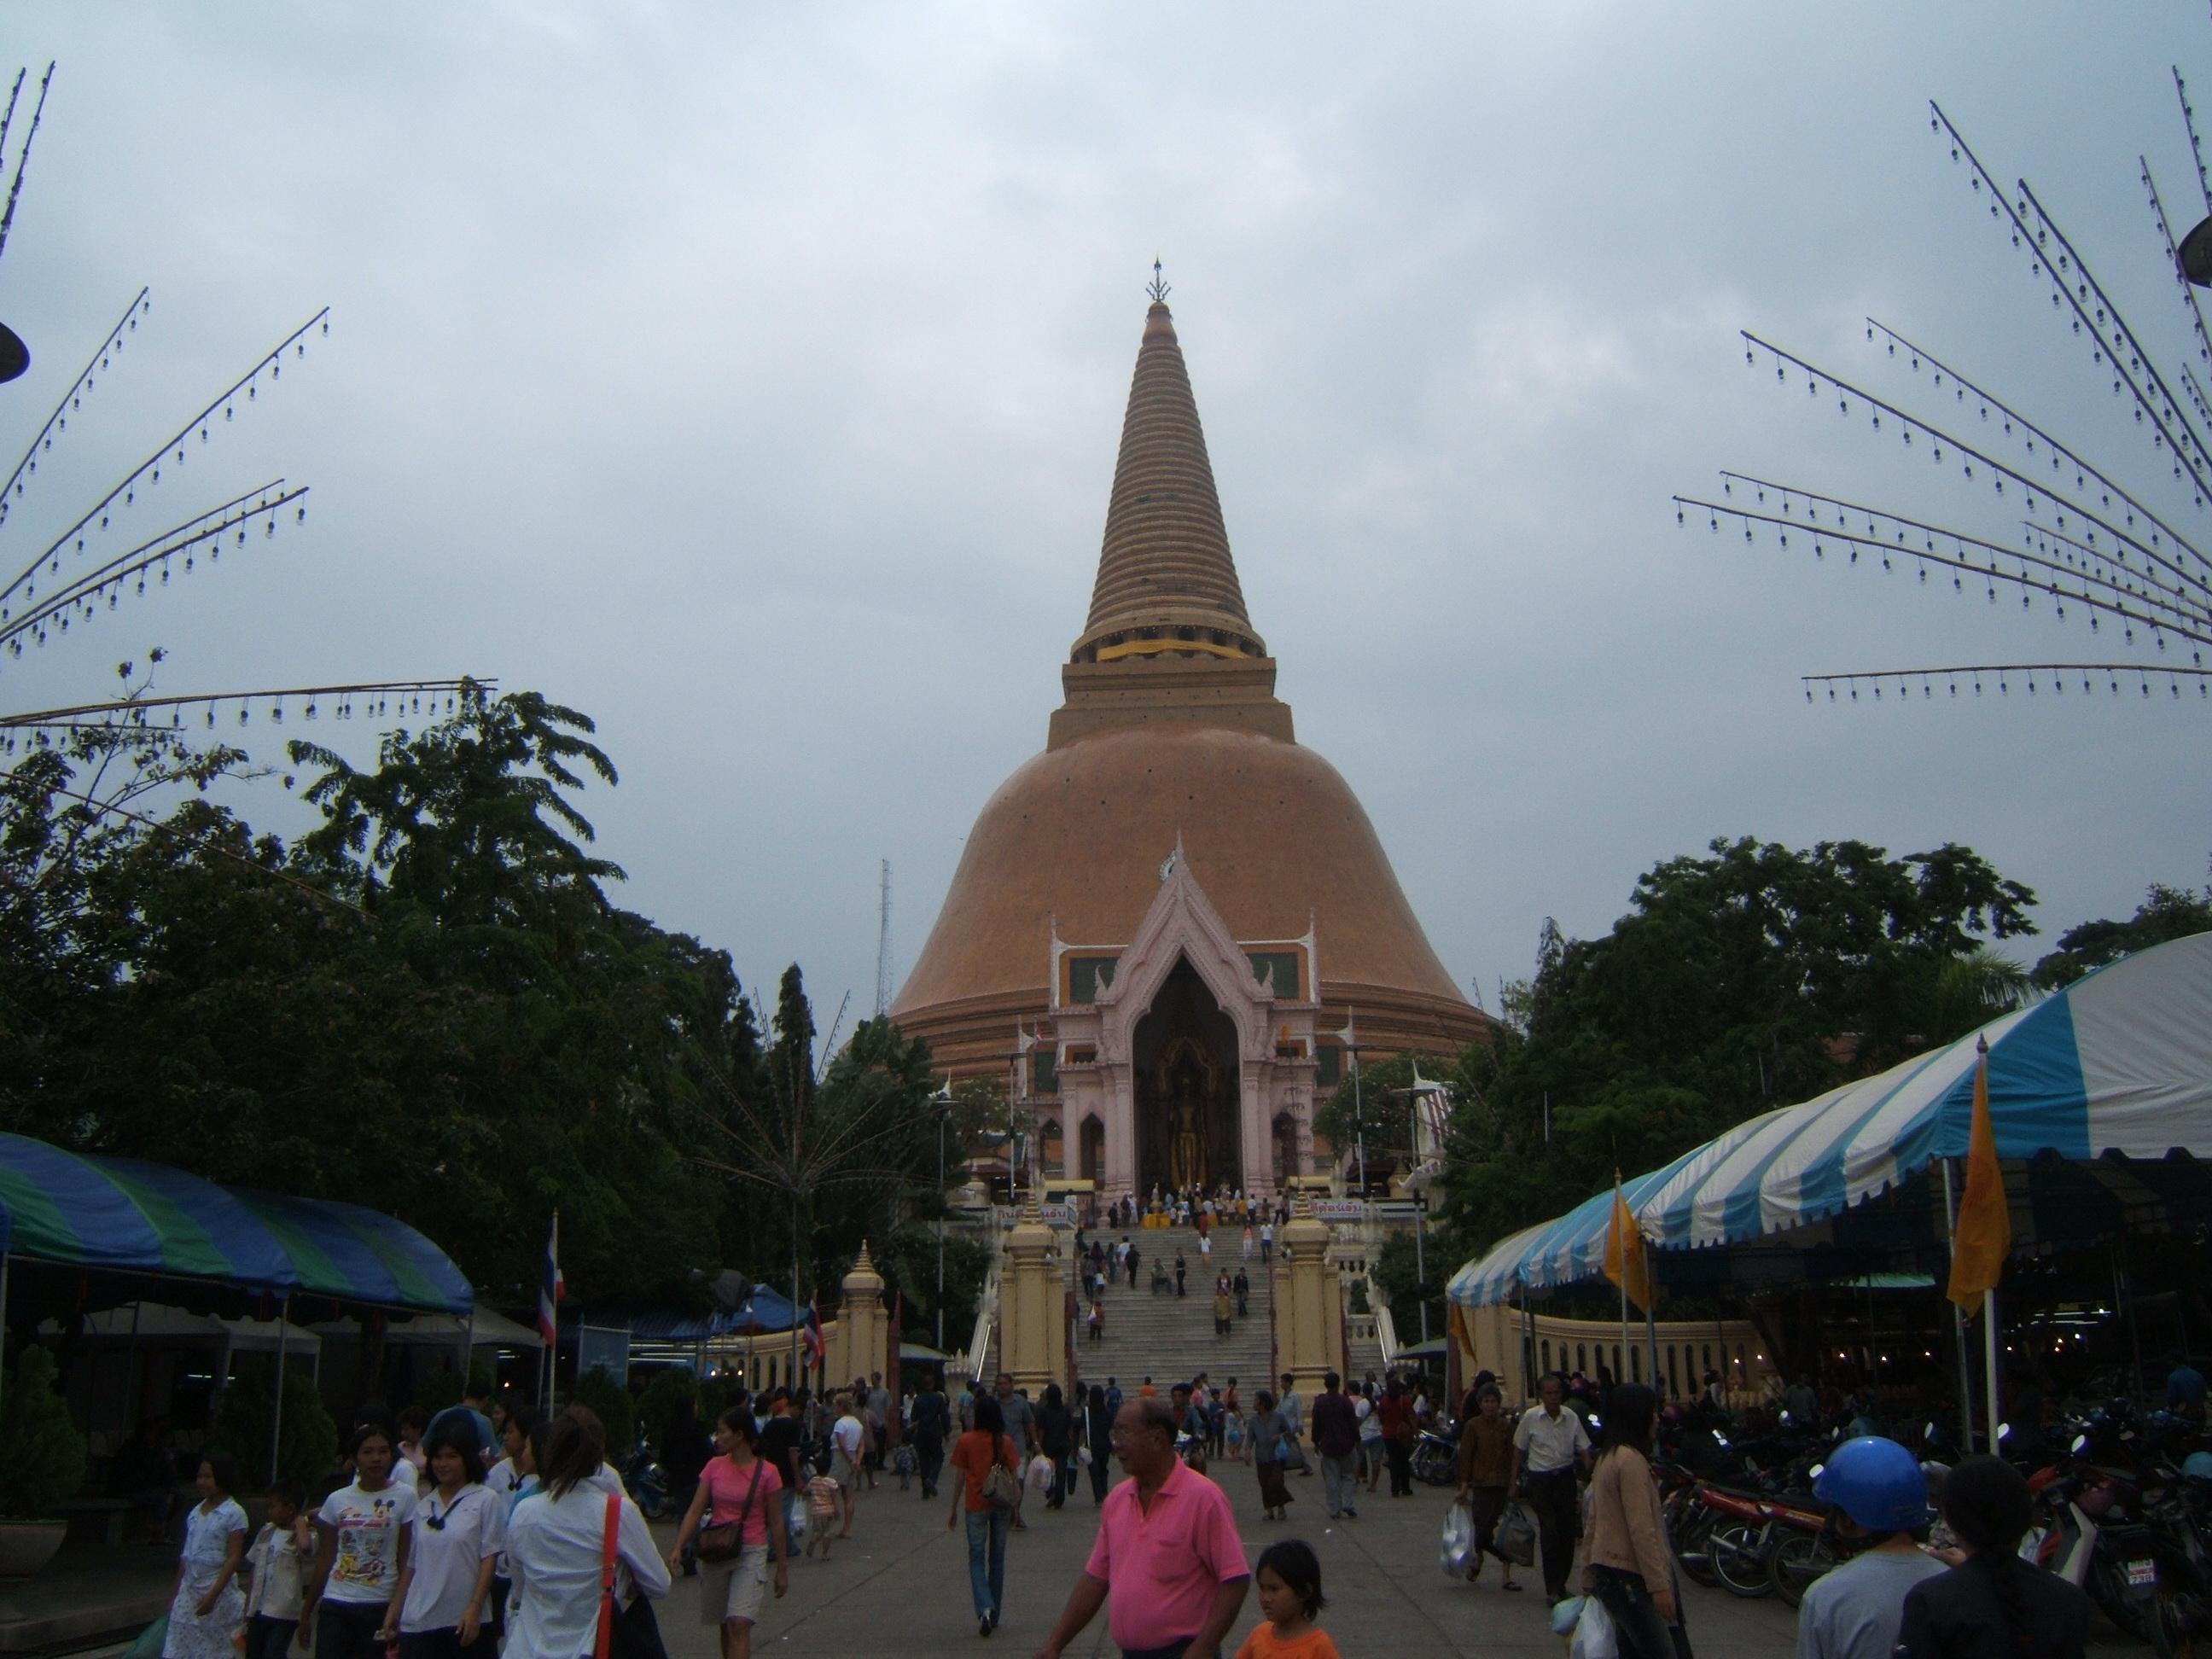 Nakhon Pathom Thailand  City pictures : Description Nakhon Pathom Chedi